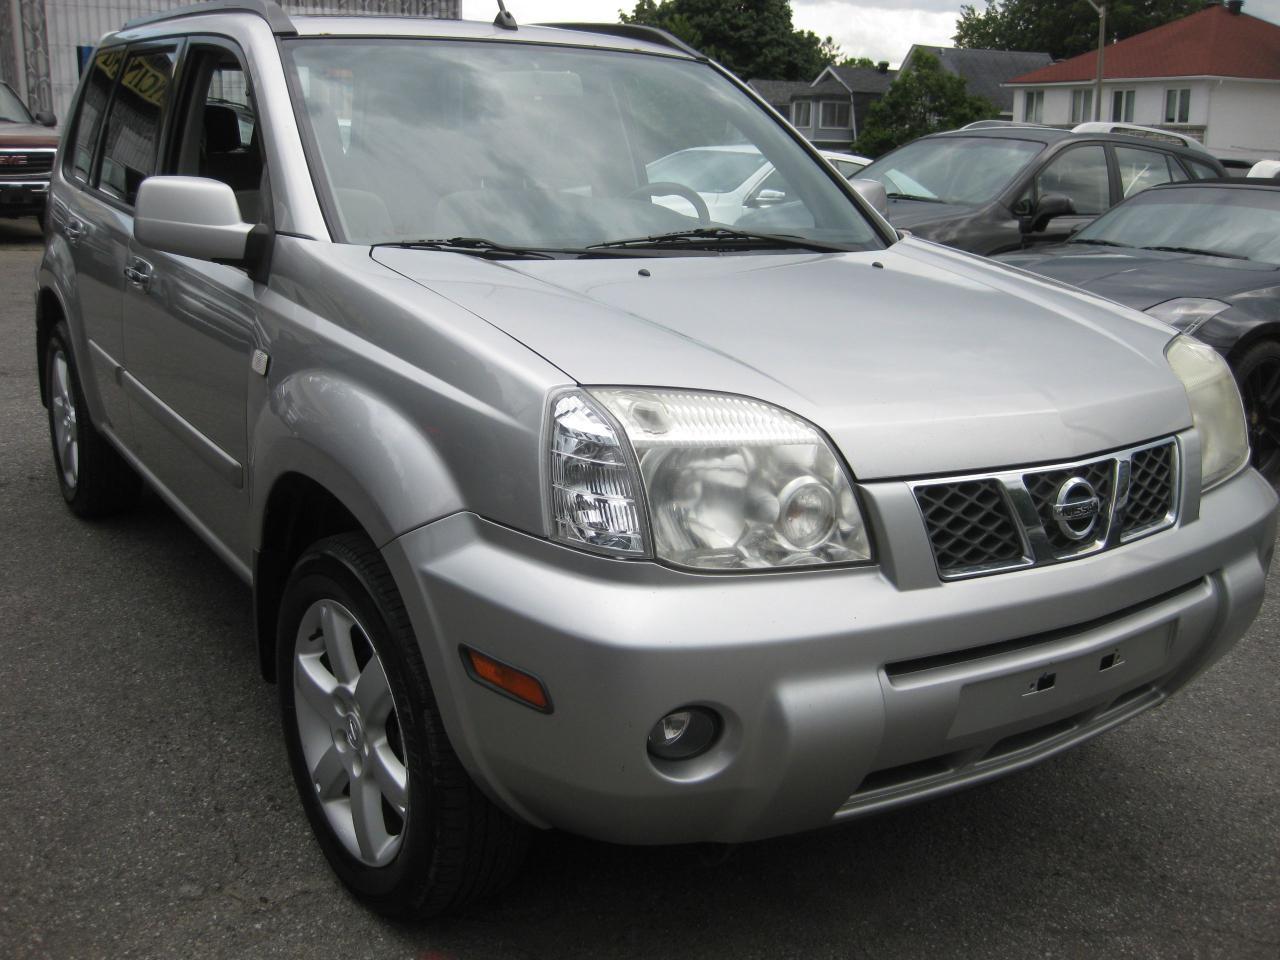 2006 Nissan X-Trail XE AWD Sunroof Auto AC Htd Seats PL PM PW Fog